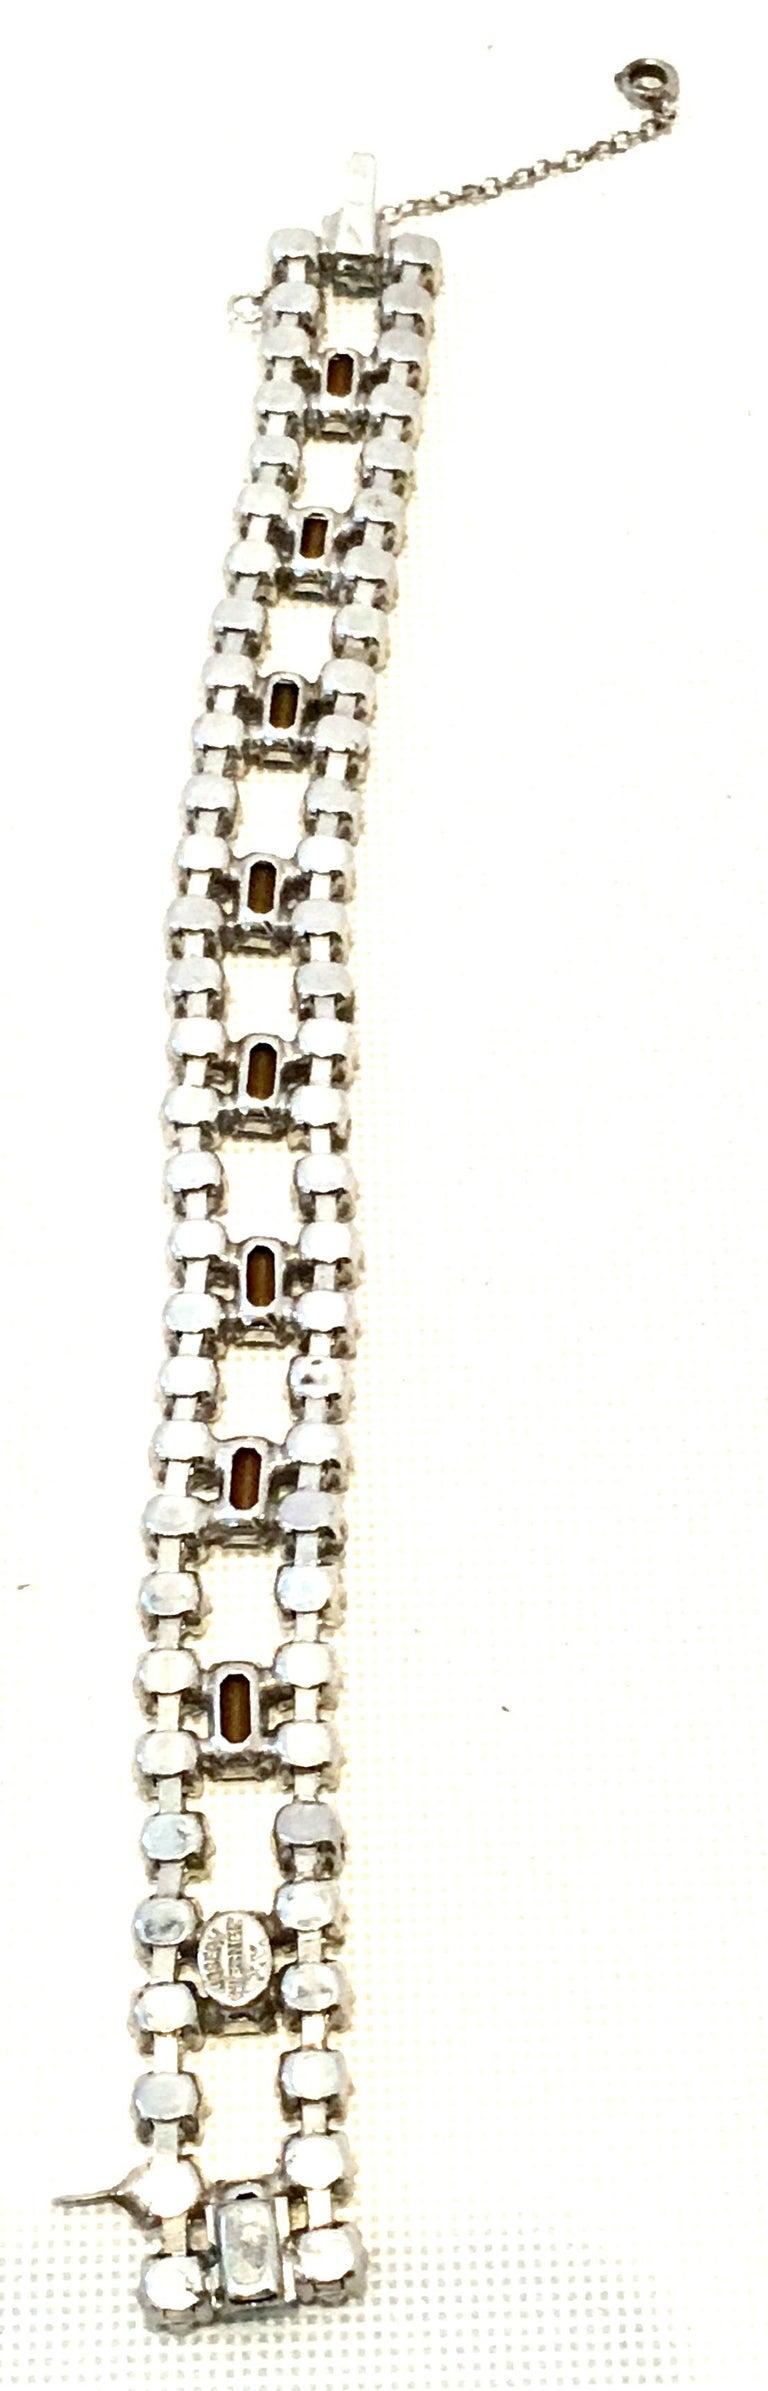 60'S Silver & Blue Sapphire Swarovski Crystal Rhineston Parure S/2 By, J Wiesner For Sale 12